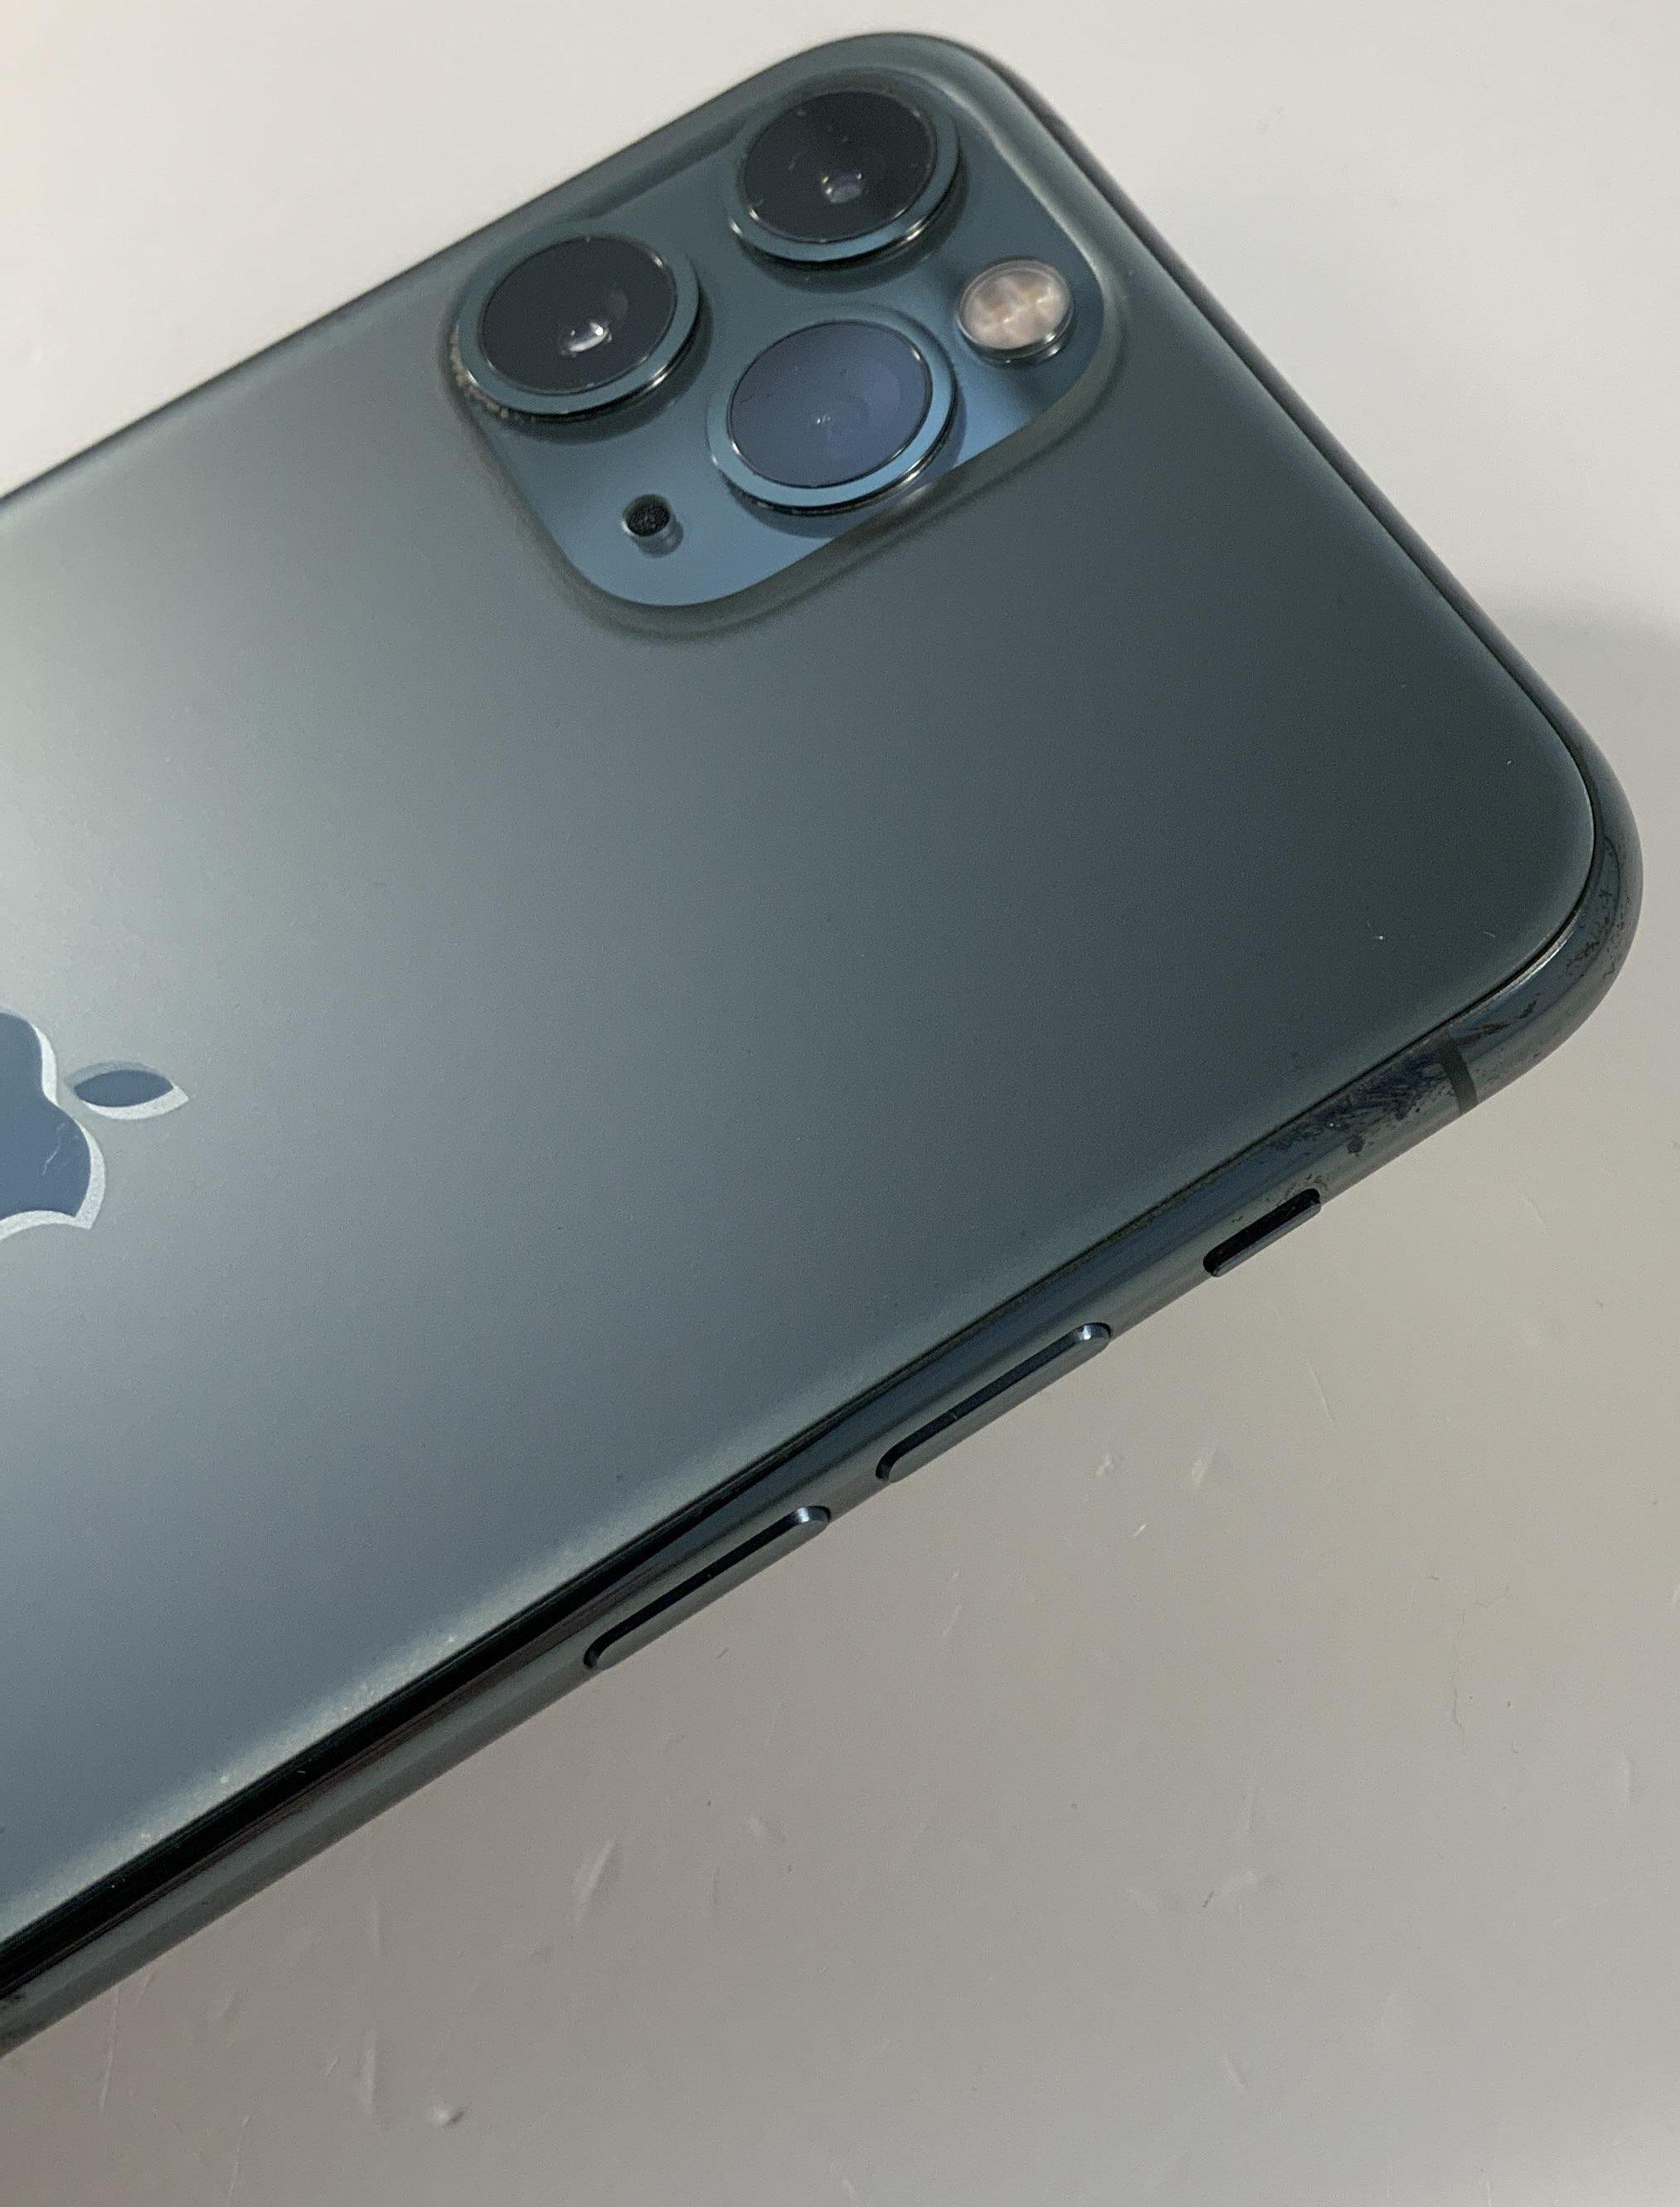 iPhone 11 Pro 256GB, 256GB, Midnight Green, Afbeelding 3